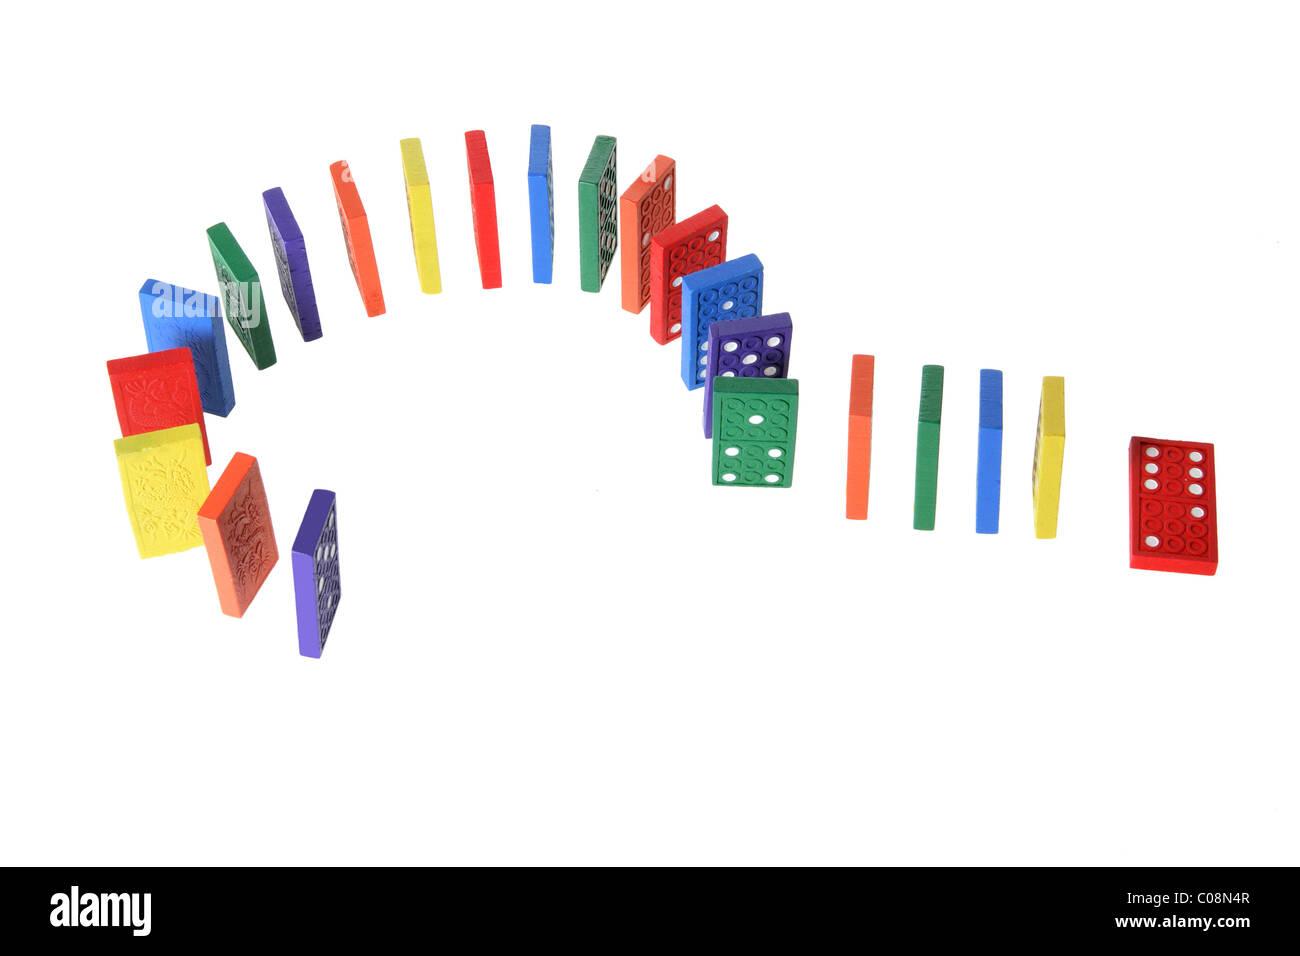 Dominoes - Stock Image